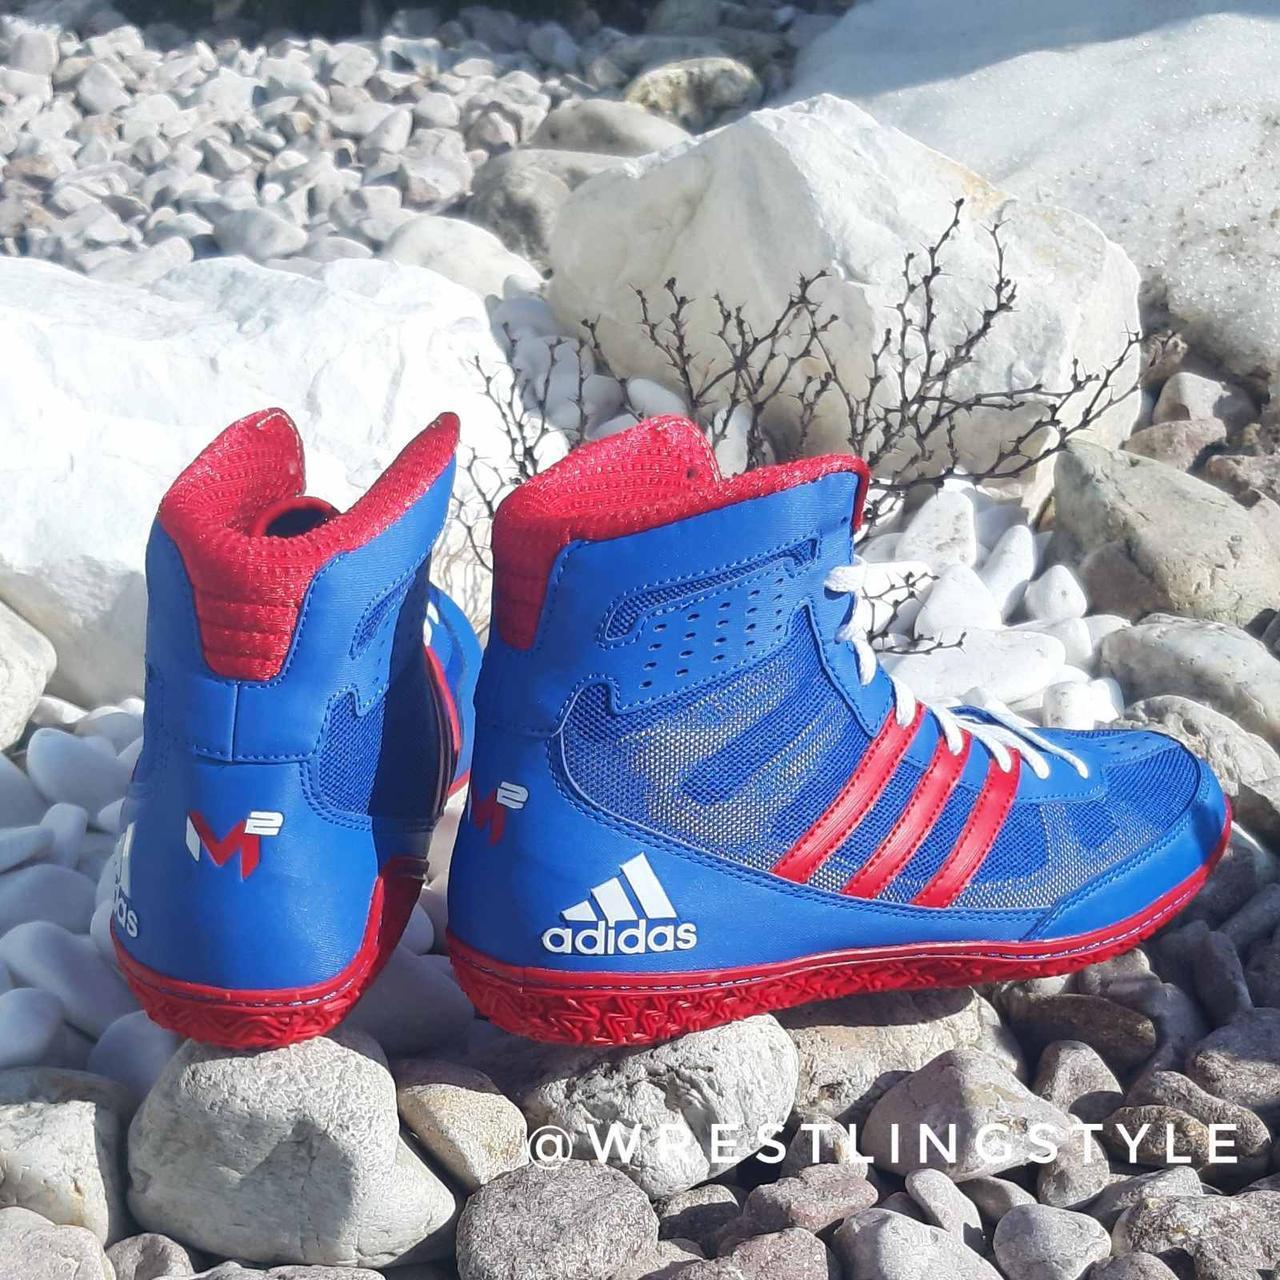 Борцовки, взуття для боксу Adidas Mat Wizard 3. Взуття для боротьби, боксу.